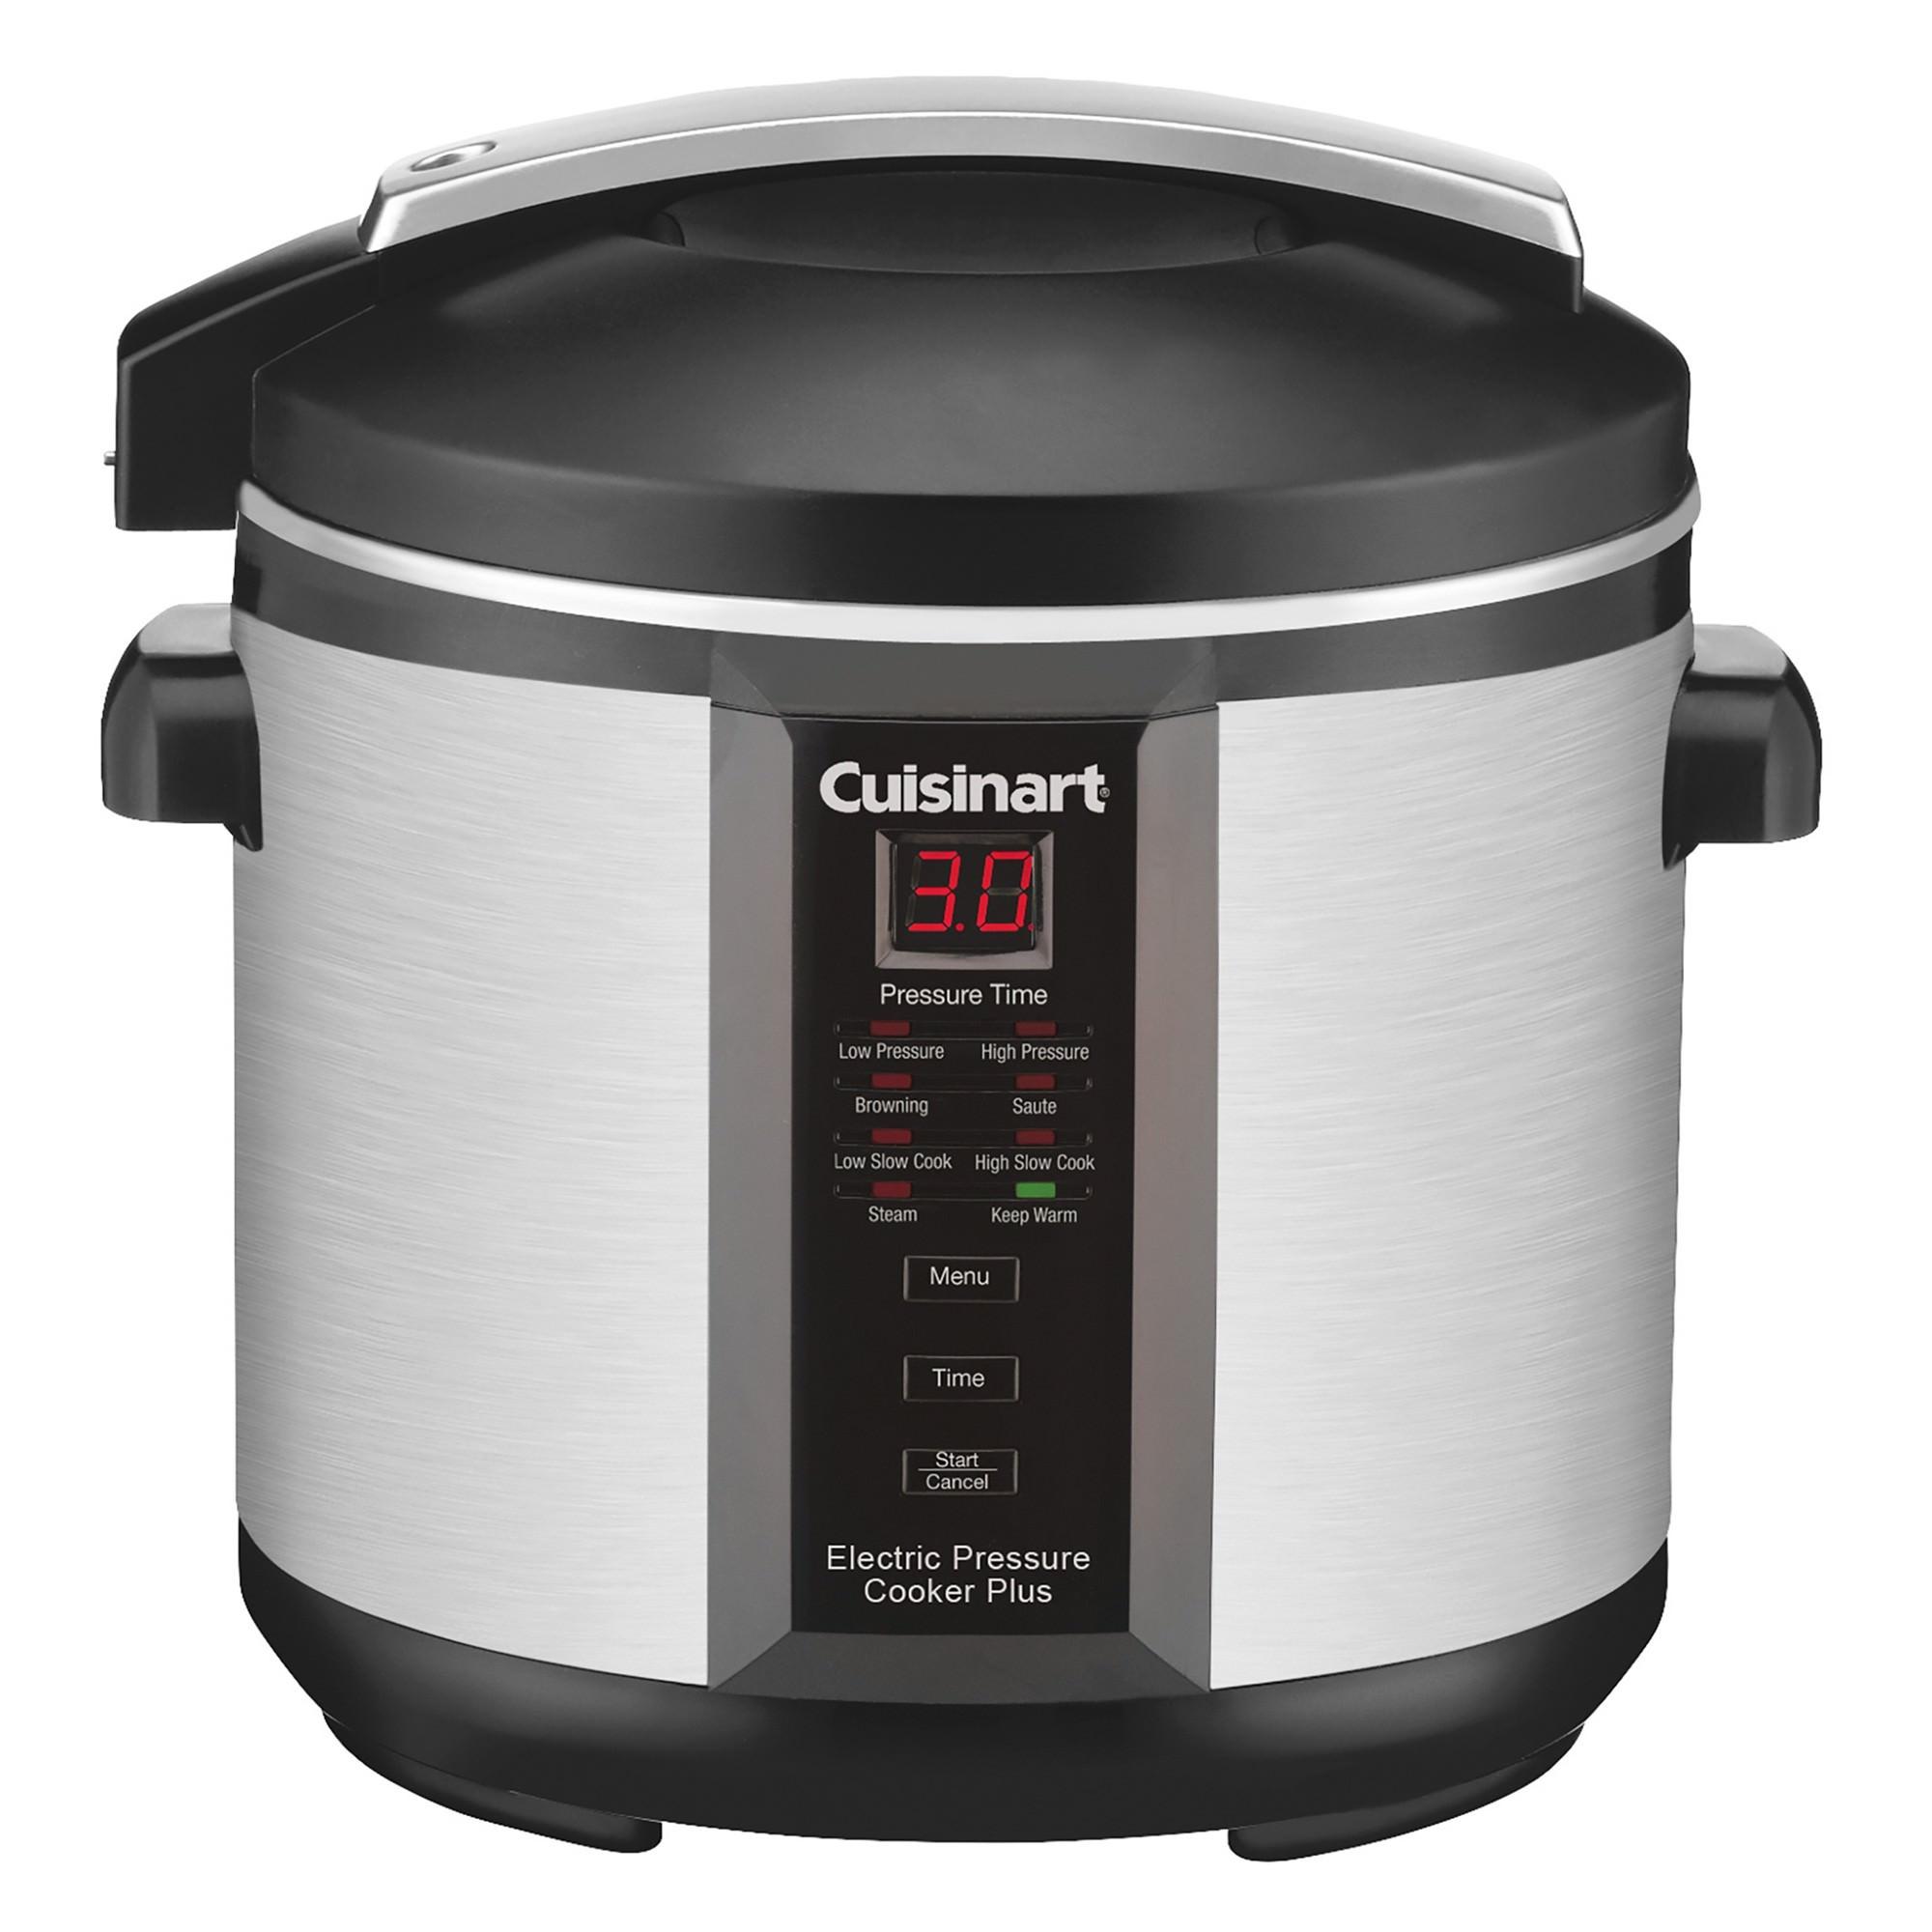 Cuisinart Electric Pressure Cooker Plus 6 Litre